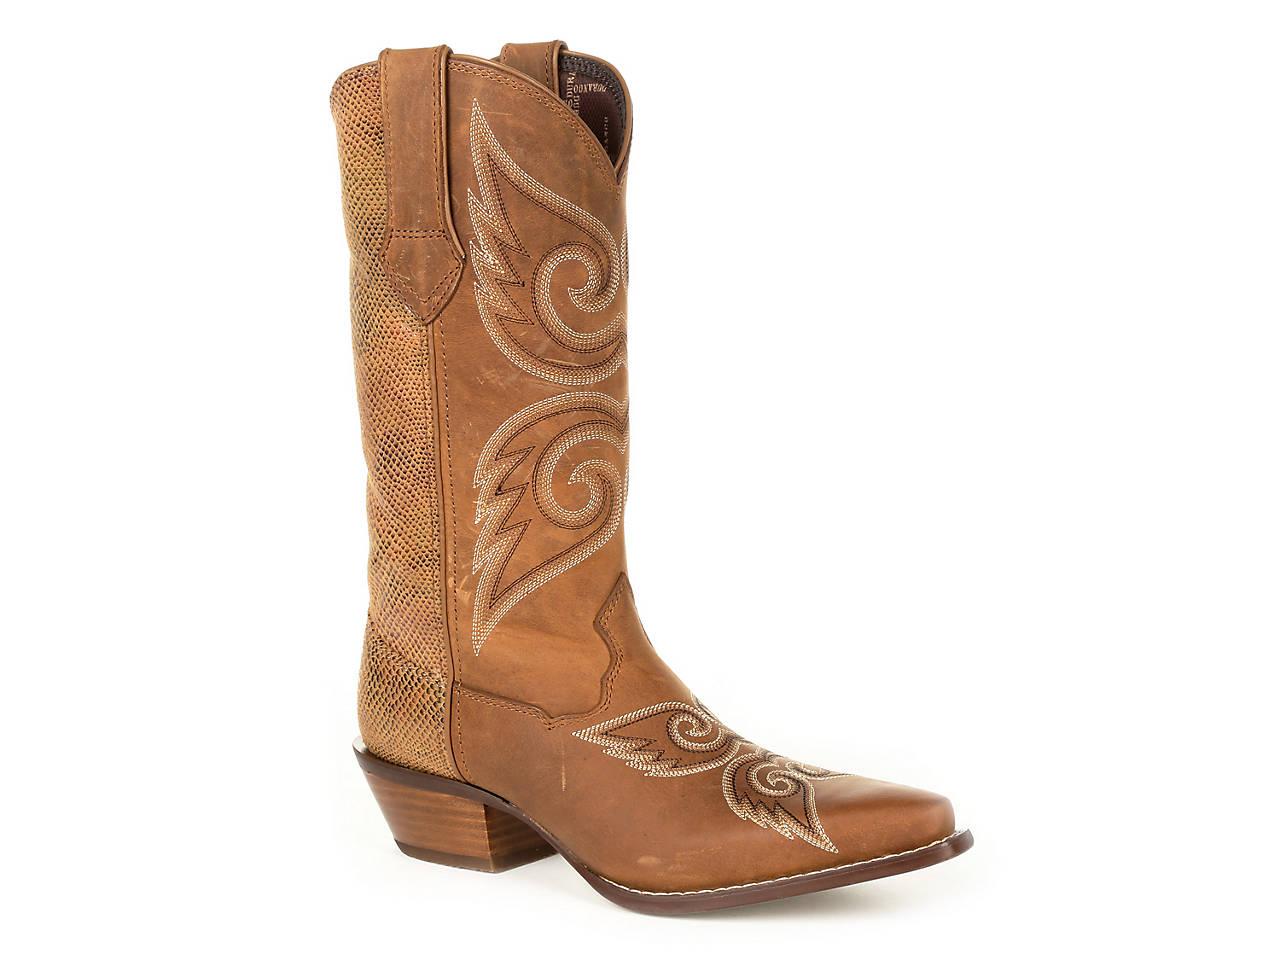 4ed23aefea8dad Durango Western Cowboy Boot Women s Shoes